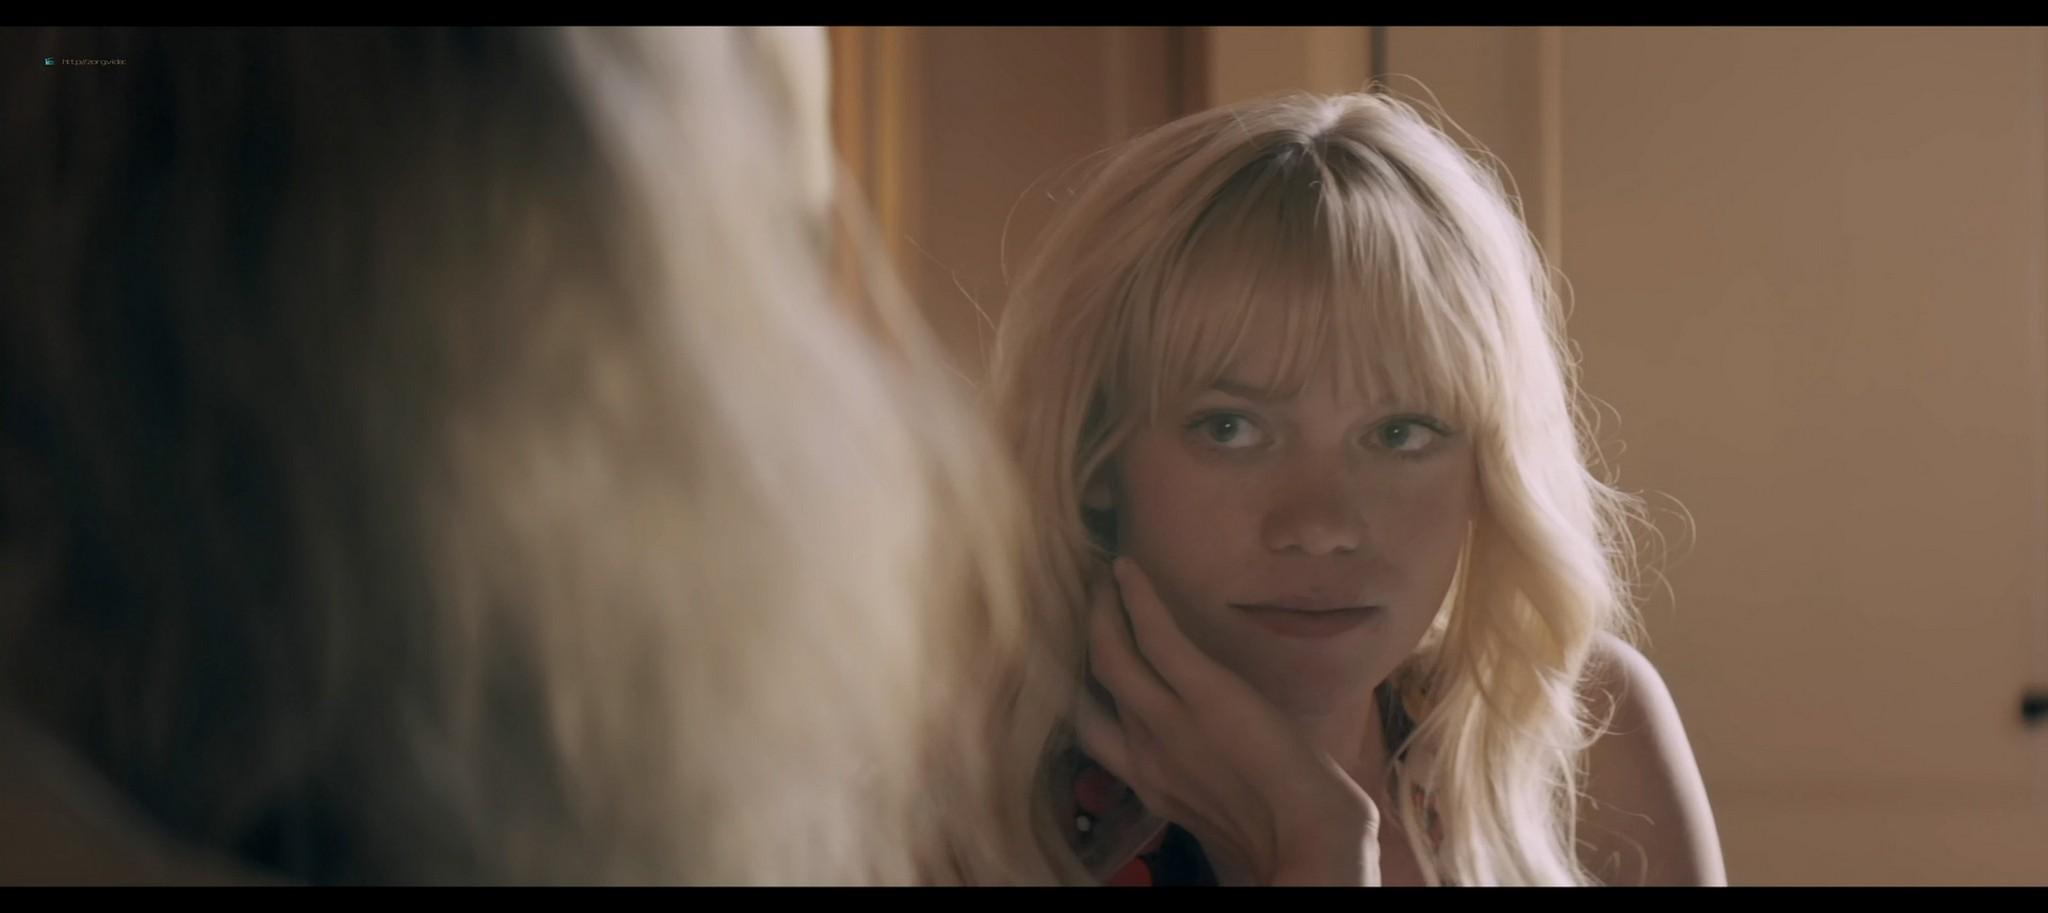 Camilla Cornelia Lehmann nude Sarahsita Lassen, nude and explicit body parts - Spies Og Glistrup (DK-2013) HD 1080p BluRay (6)